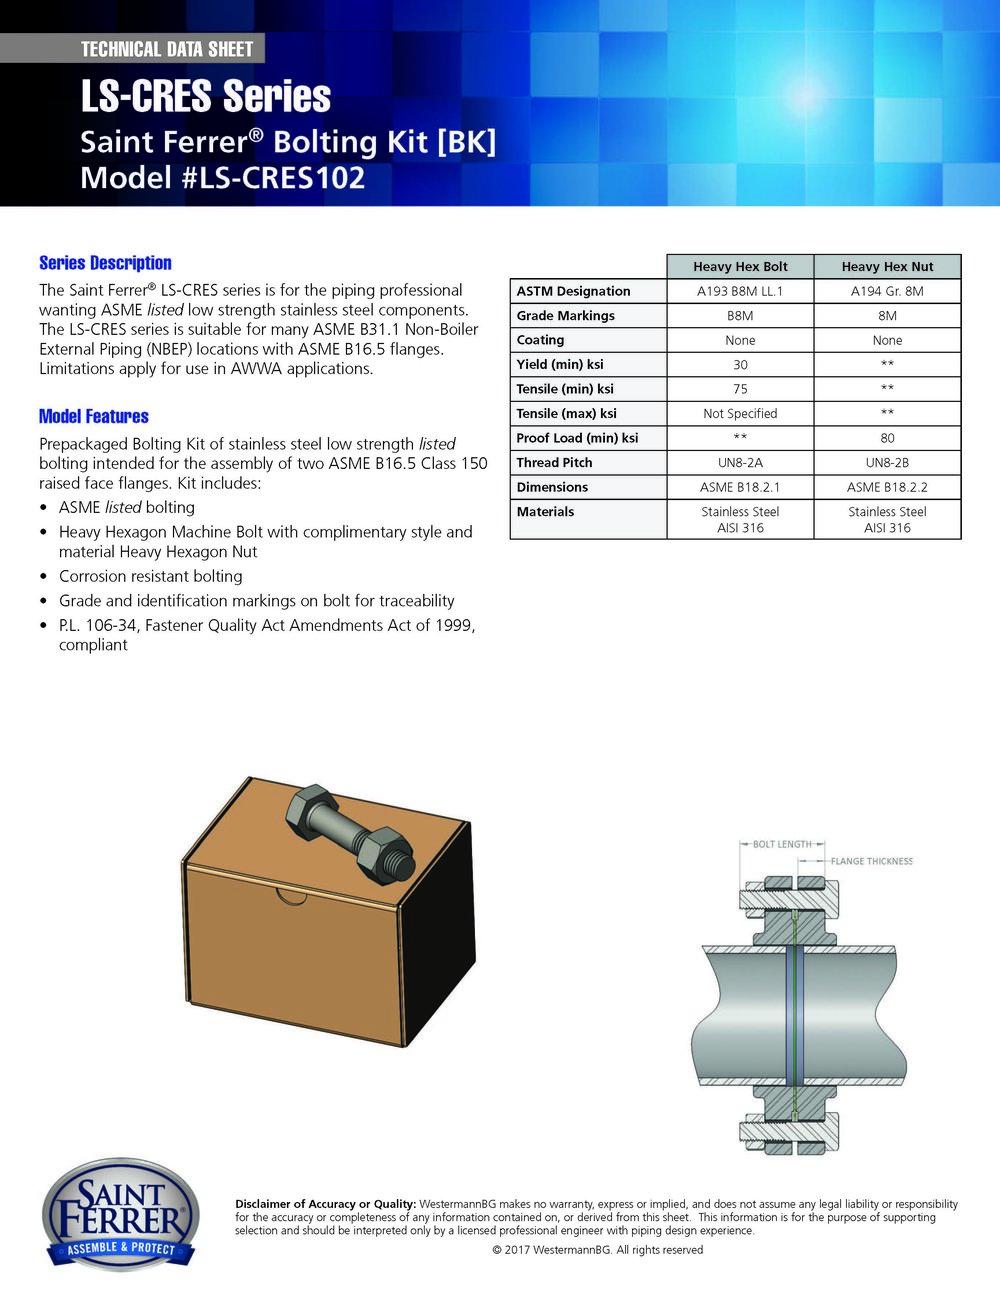 SF_Data_Sheet_LS-CRES_Series_LS-CRES102.jpg